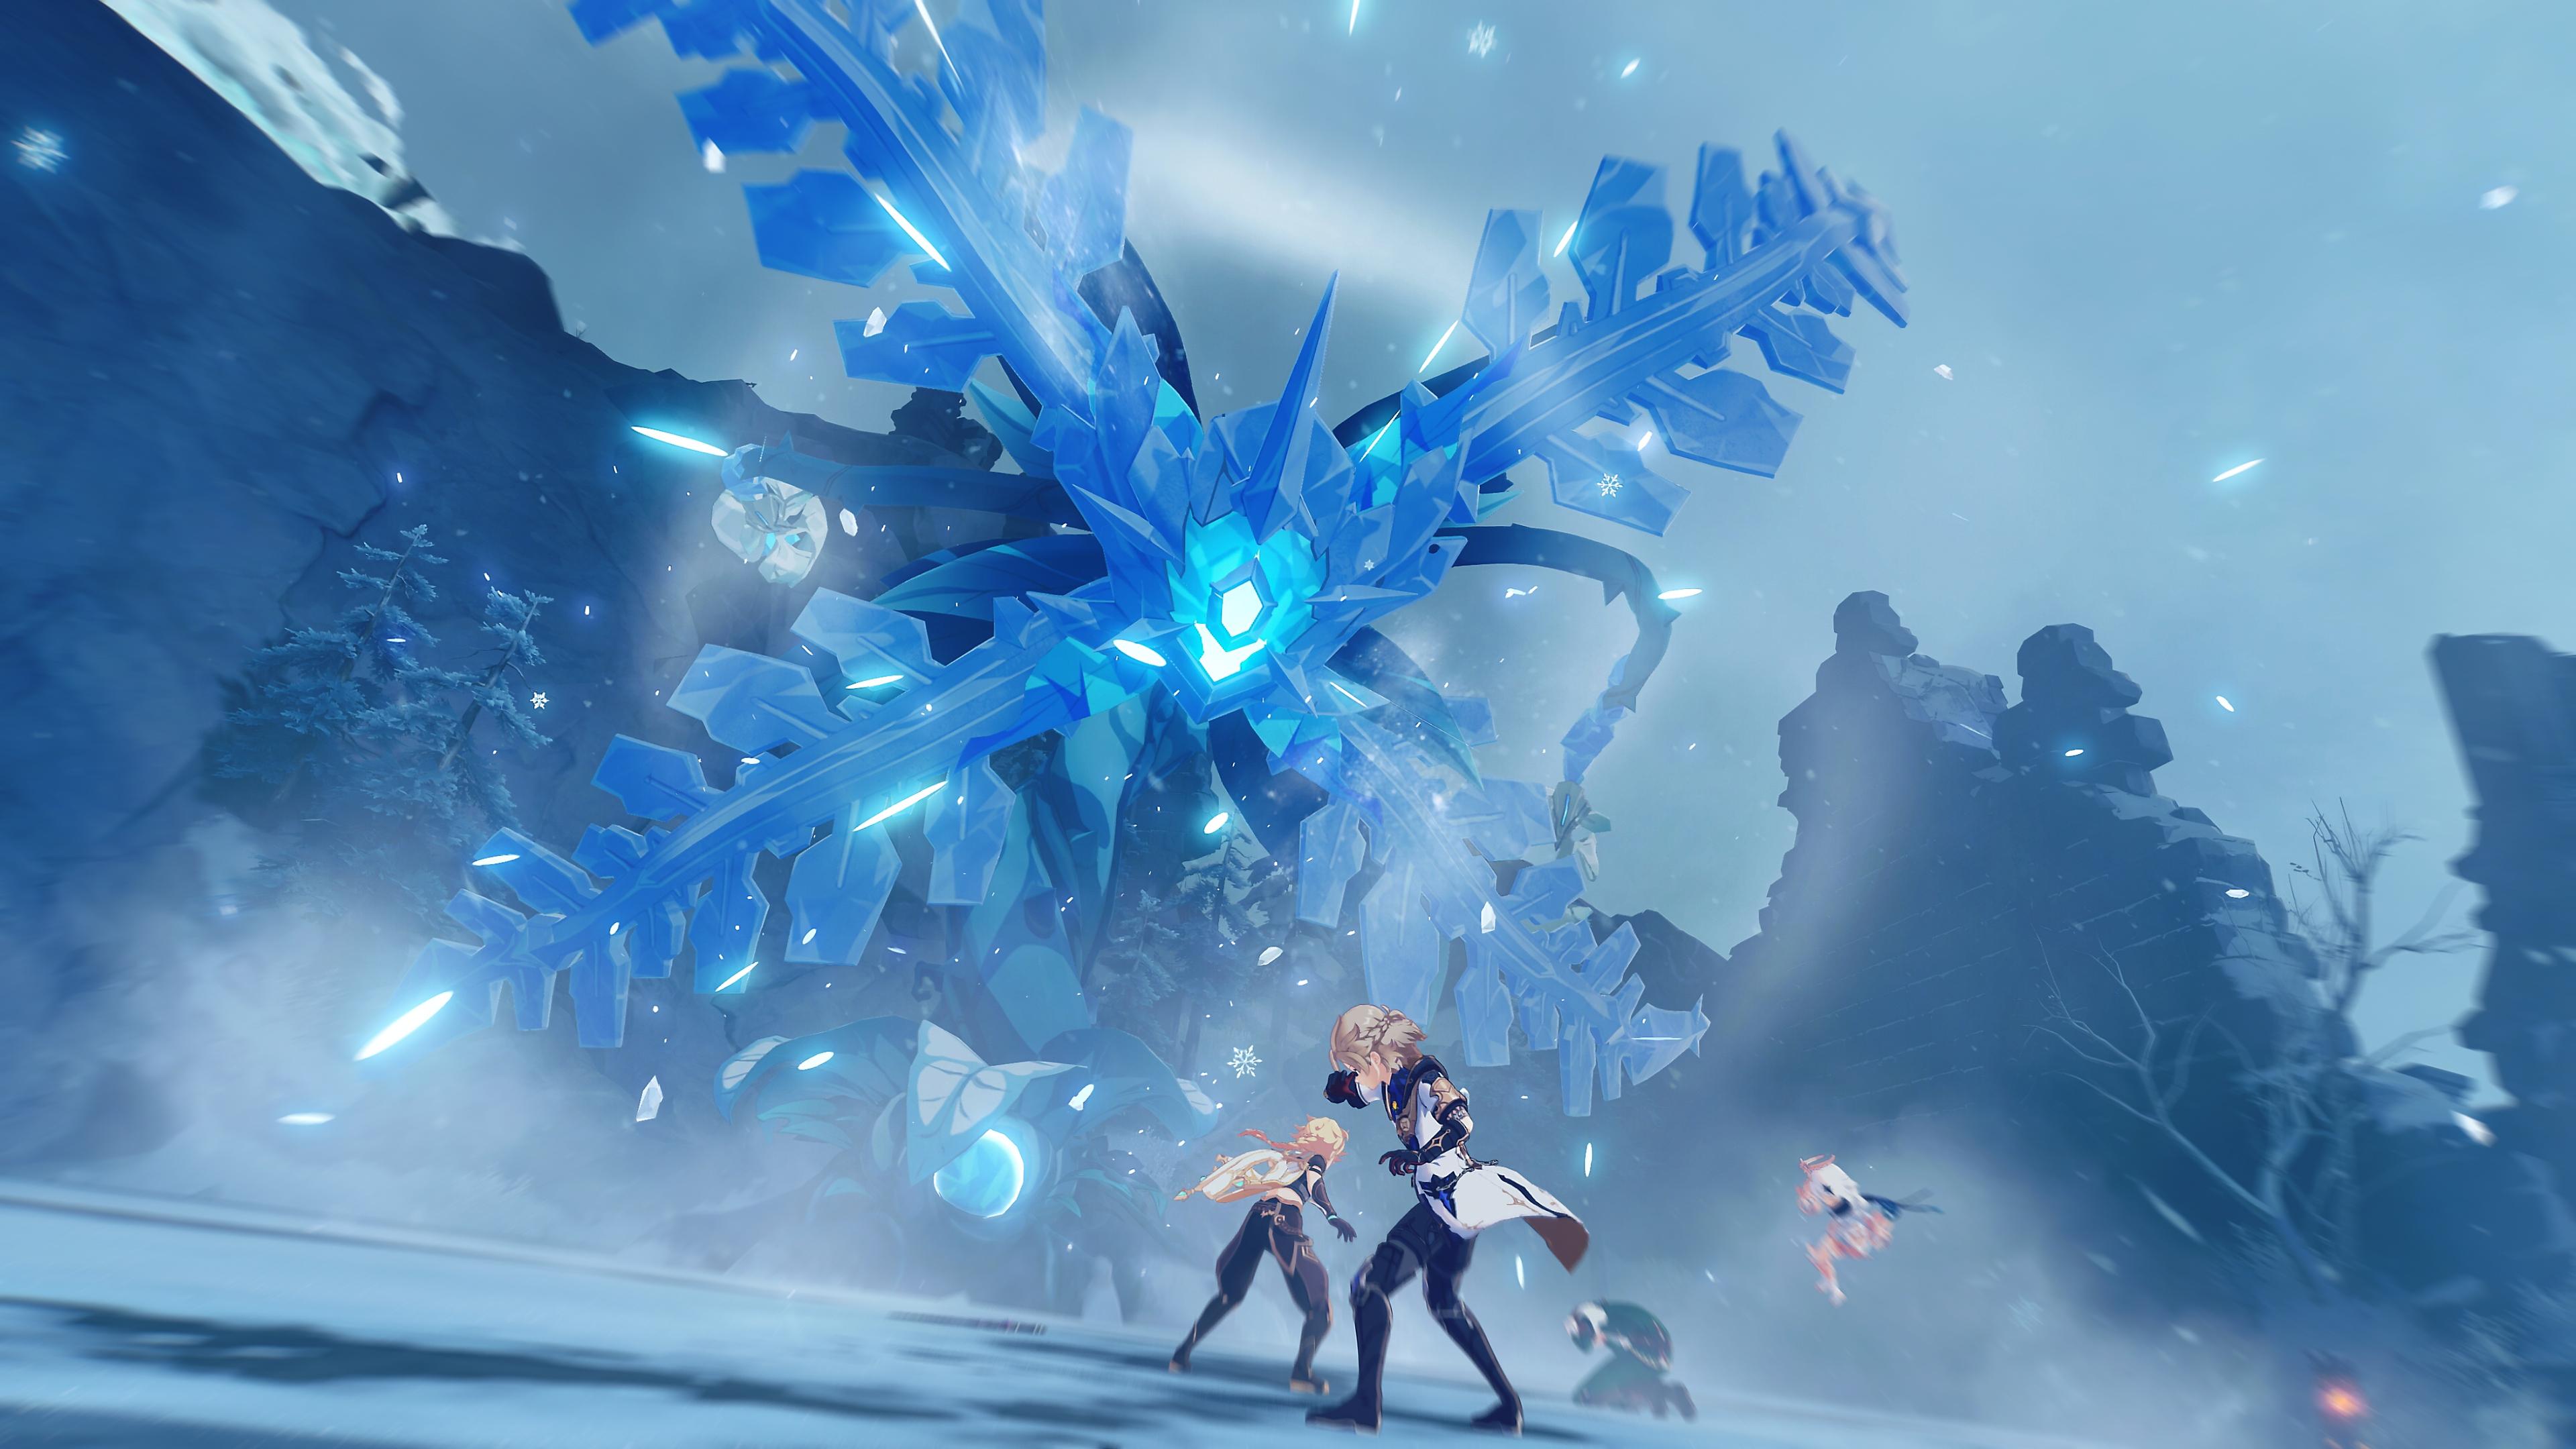 Genshin Impact - Gallery Image 1